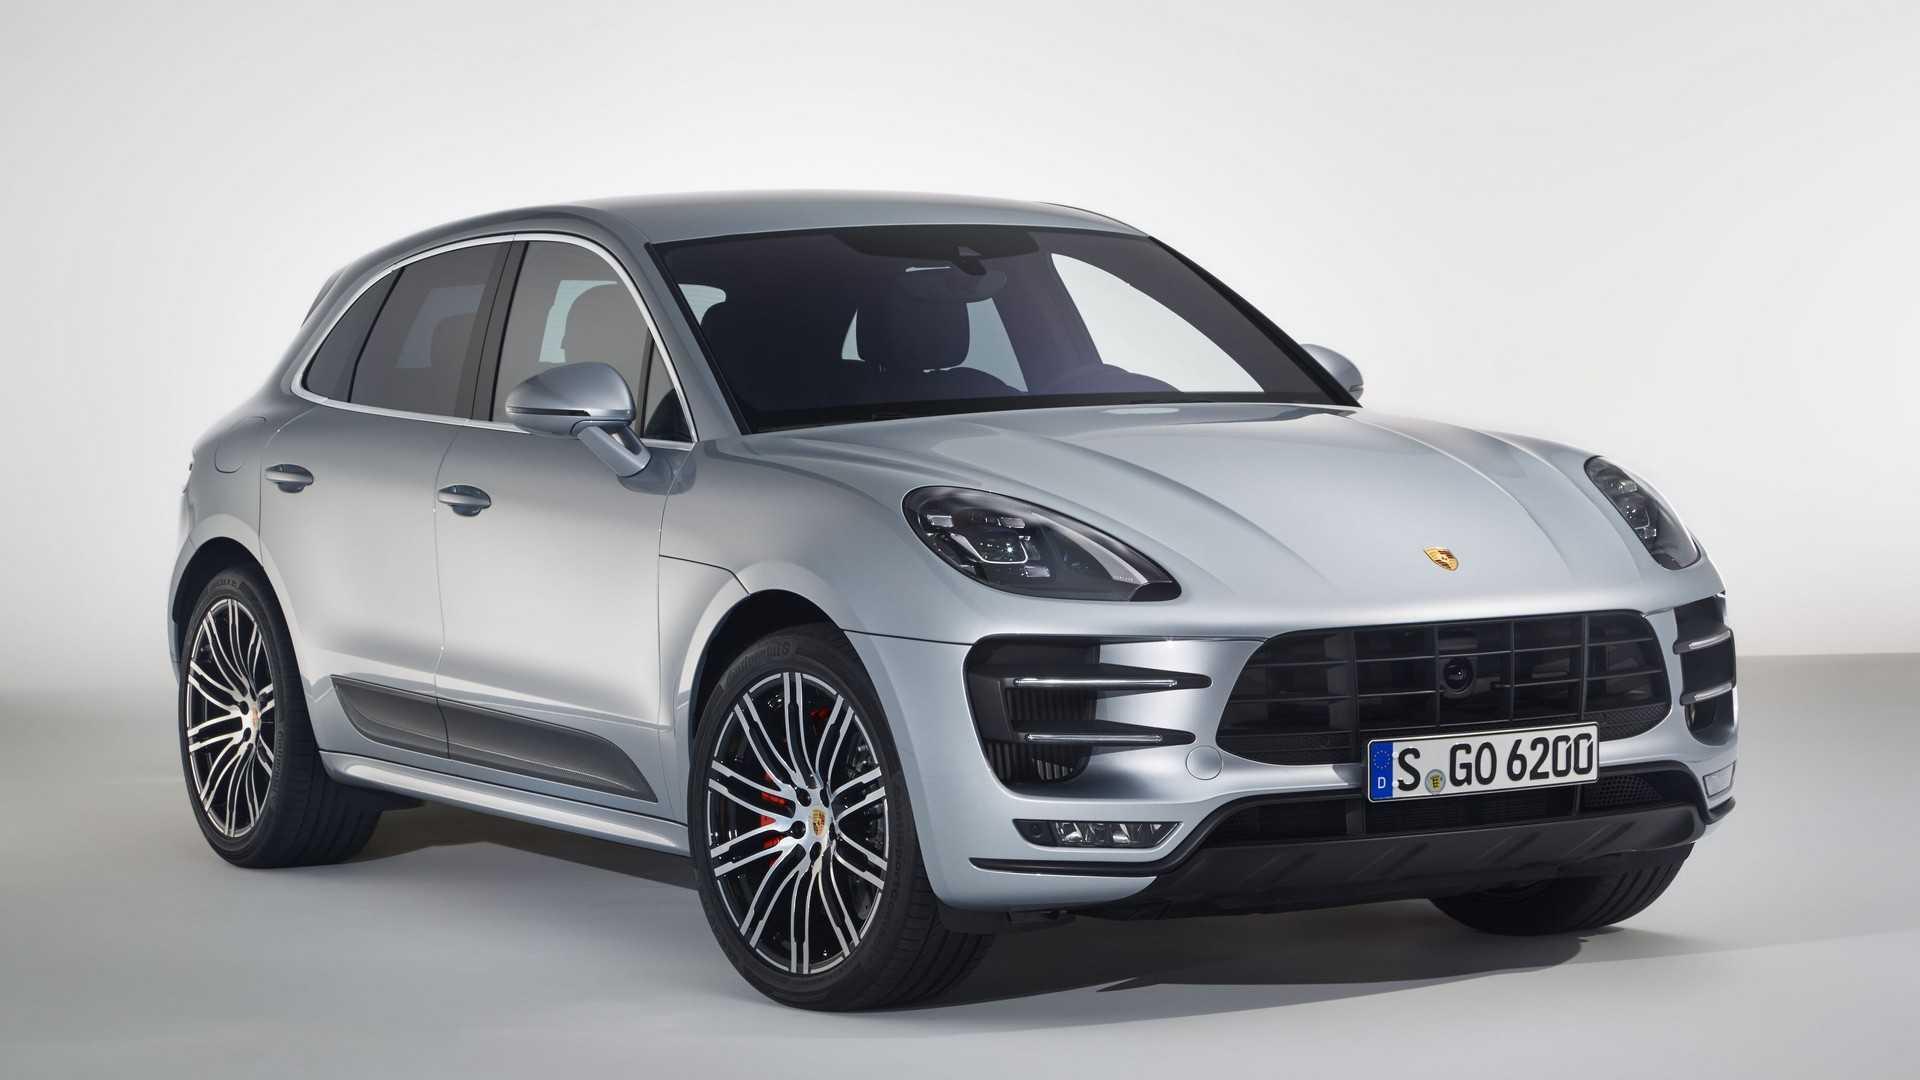 Porsche Recalls 51k Macans For Fuel Pump Leak